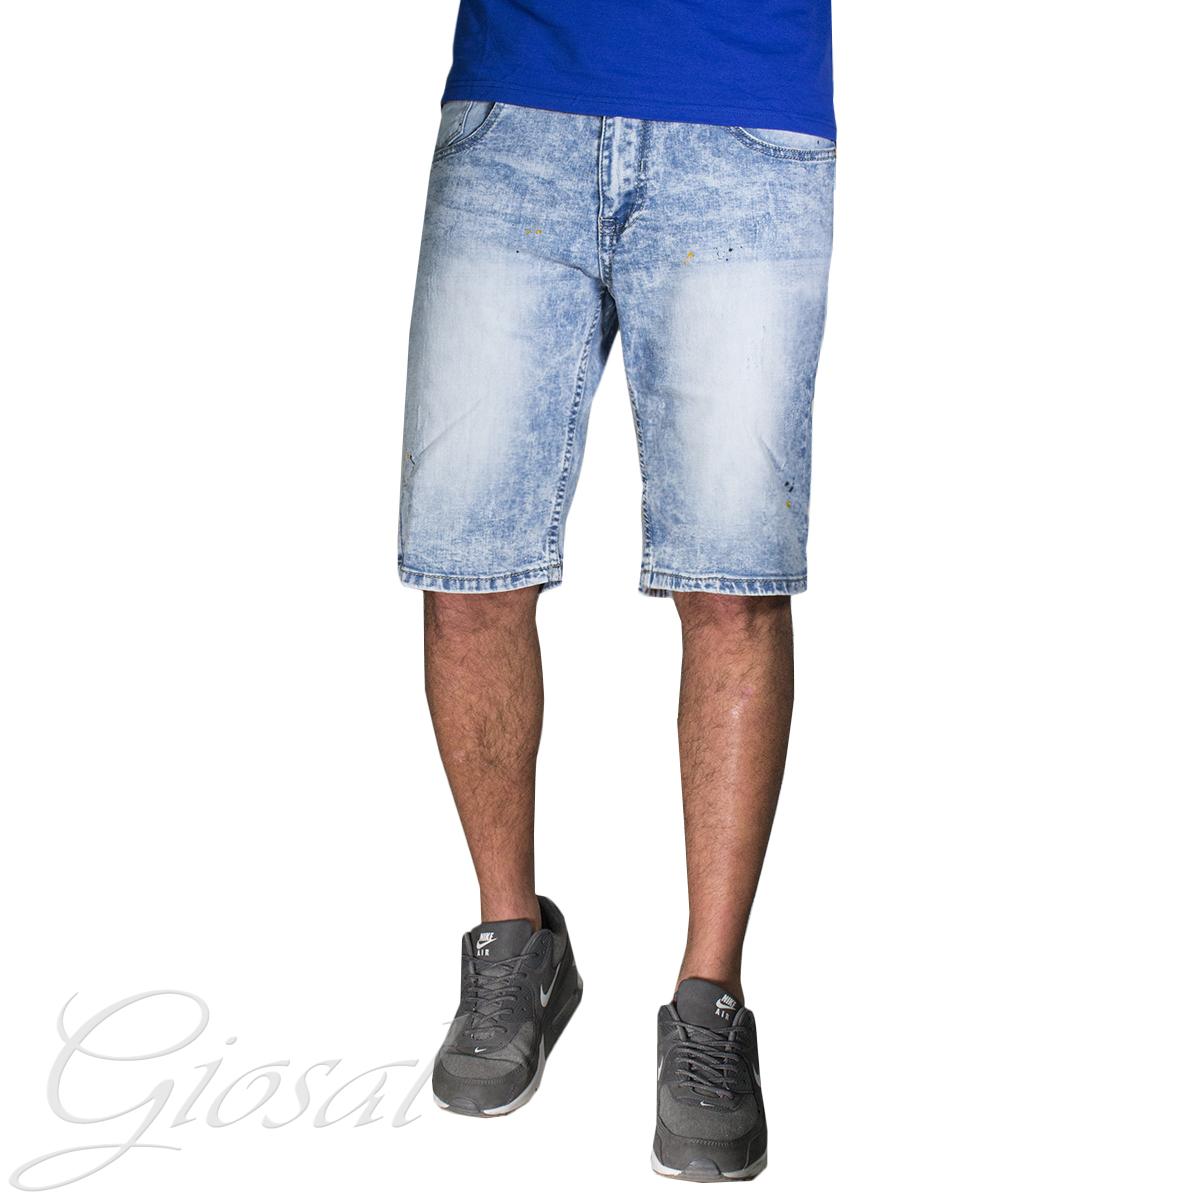 Pantalone-Uomo-Corto-Bermuda-Denim-Jeans-Macchie-Di-Pitture-Cinque-Tasche-GIOSAL